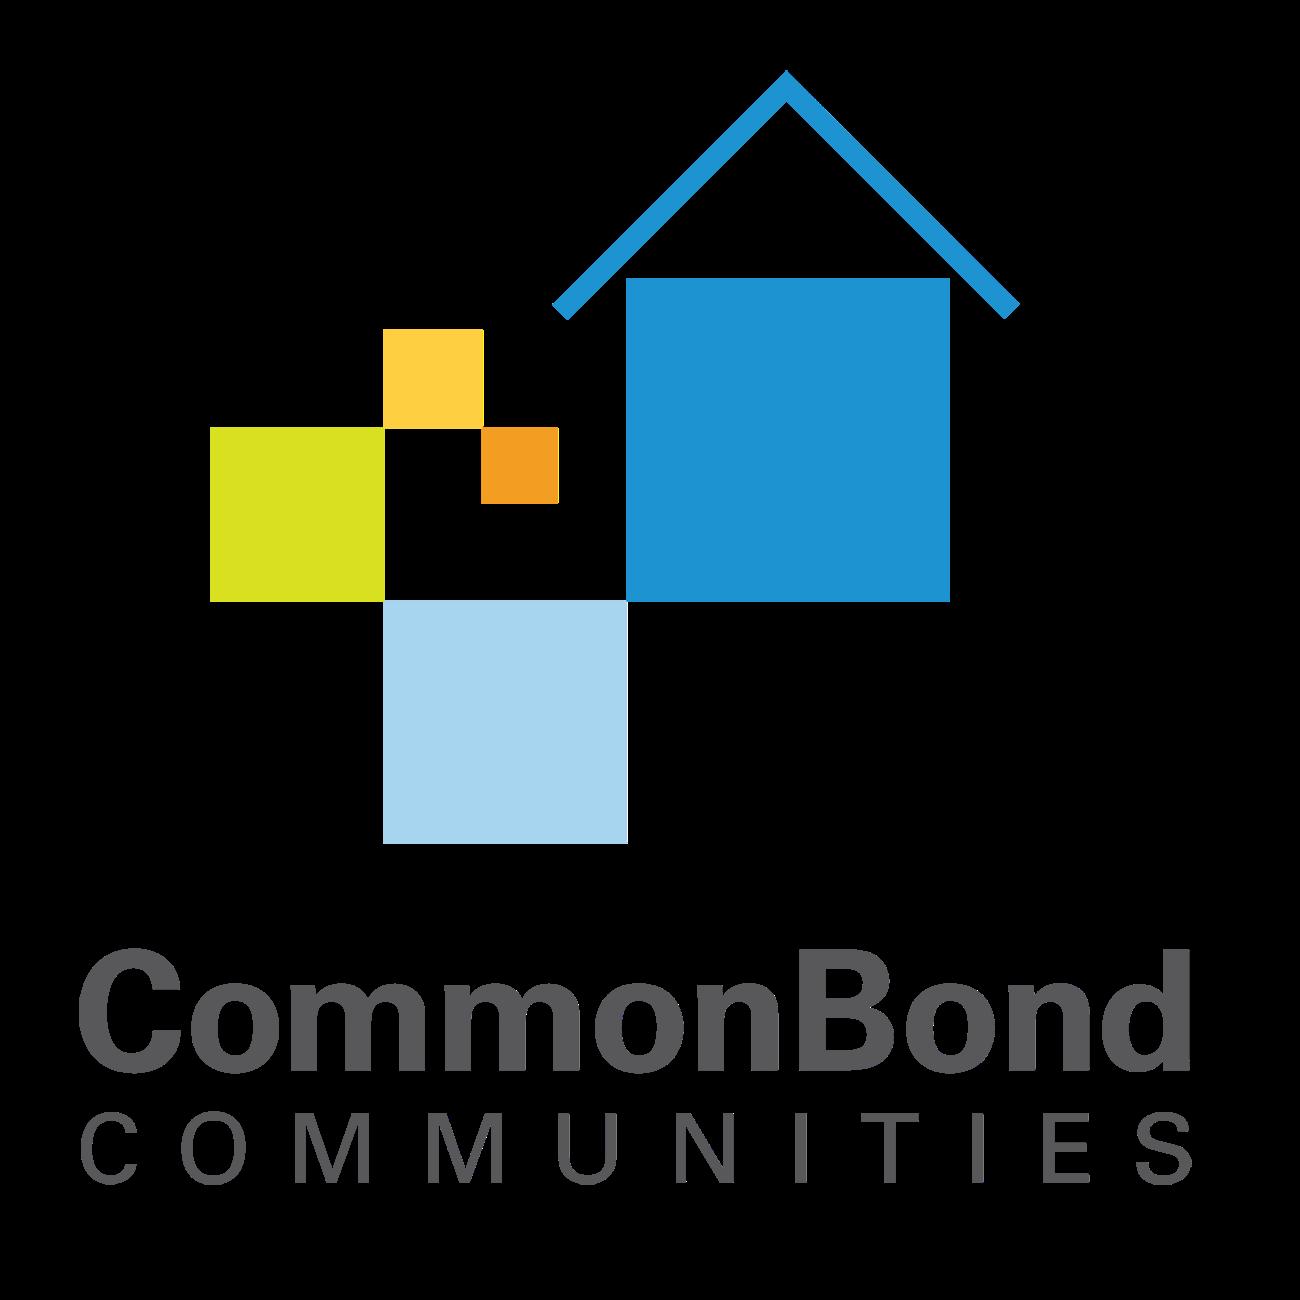 CommonbondCommunities